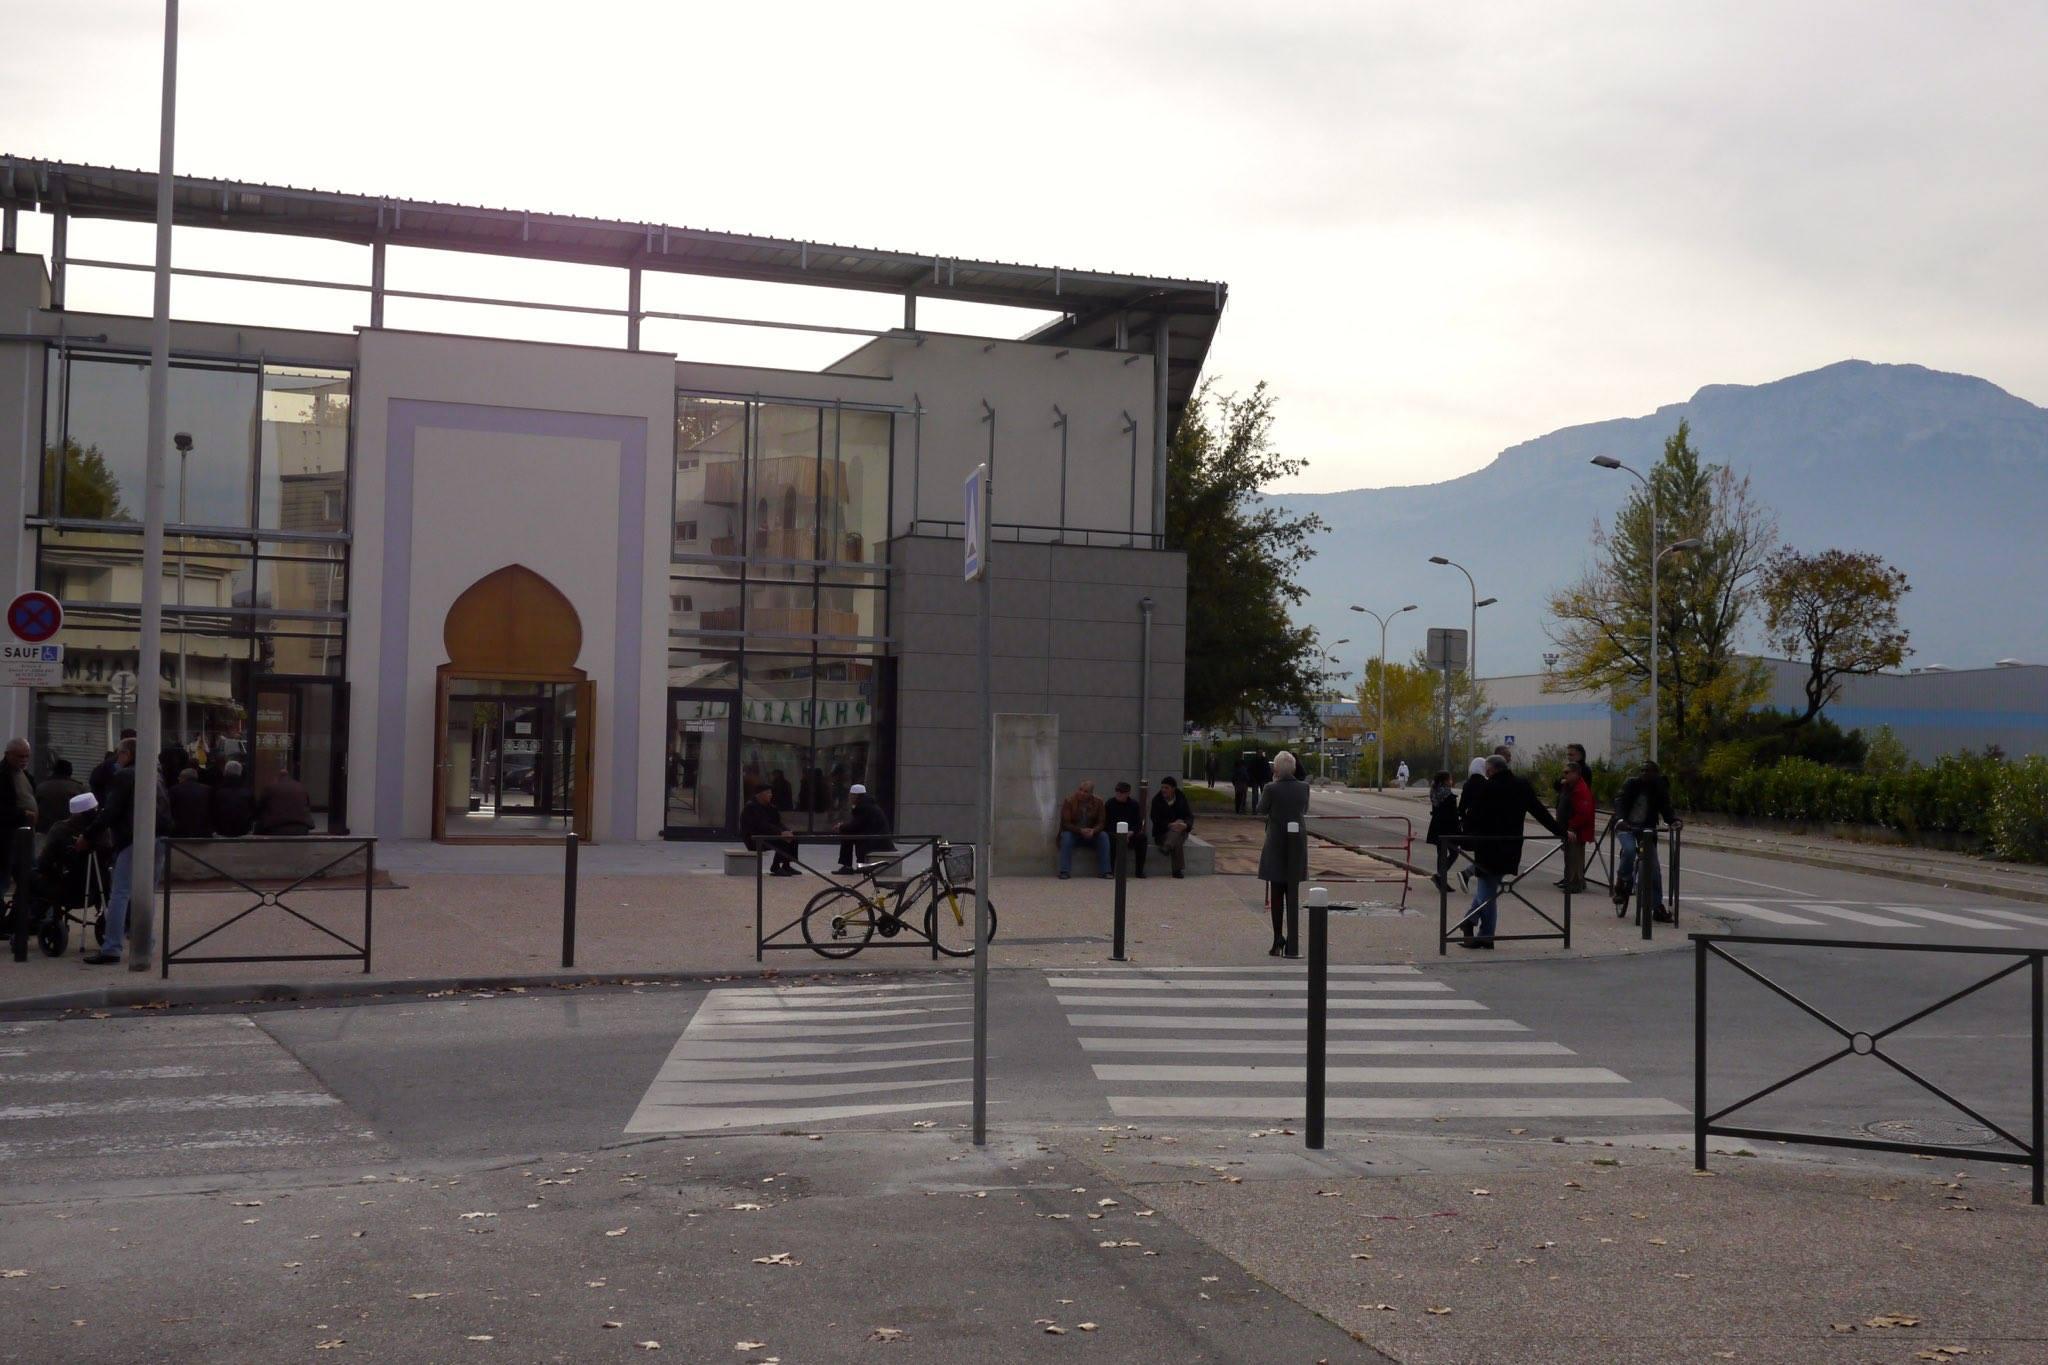 Inauguration de la mosquée Omar de Saint-Martin-d'Hères 3